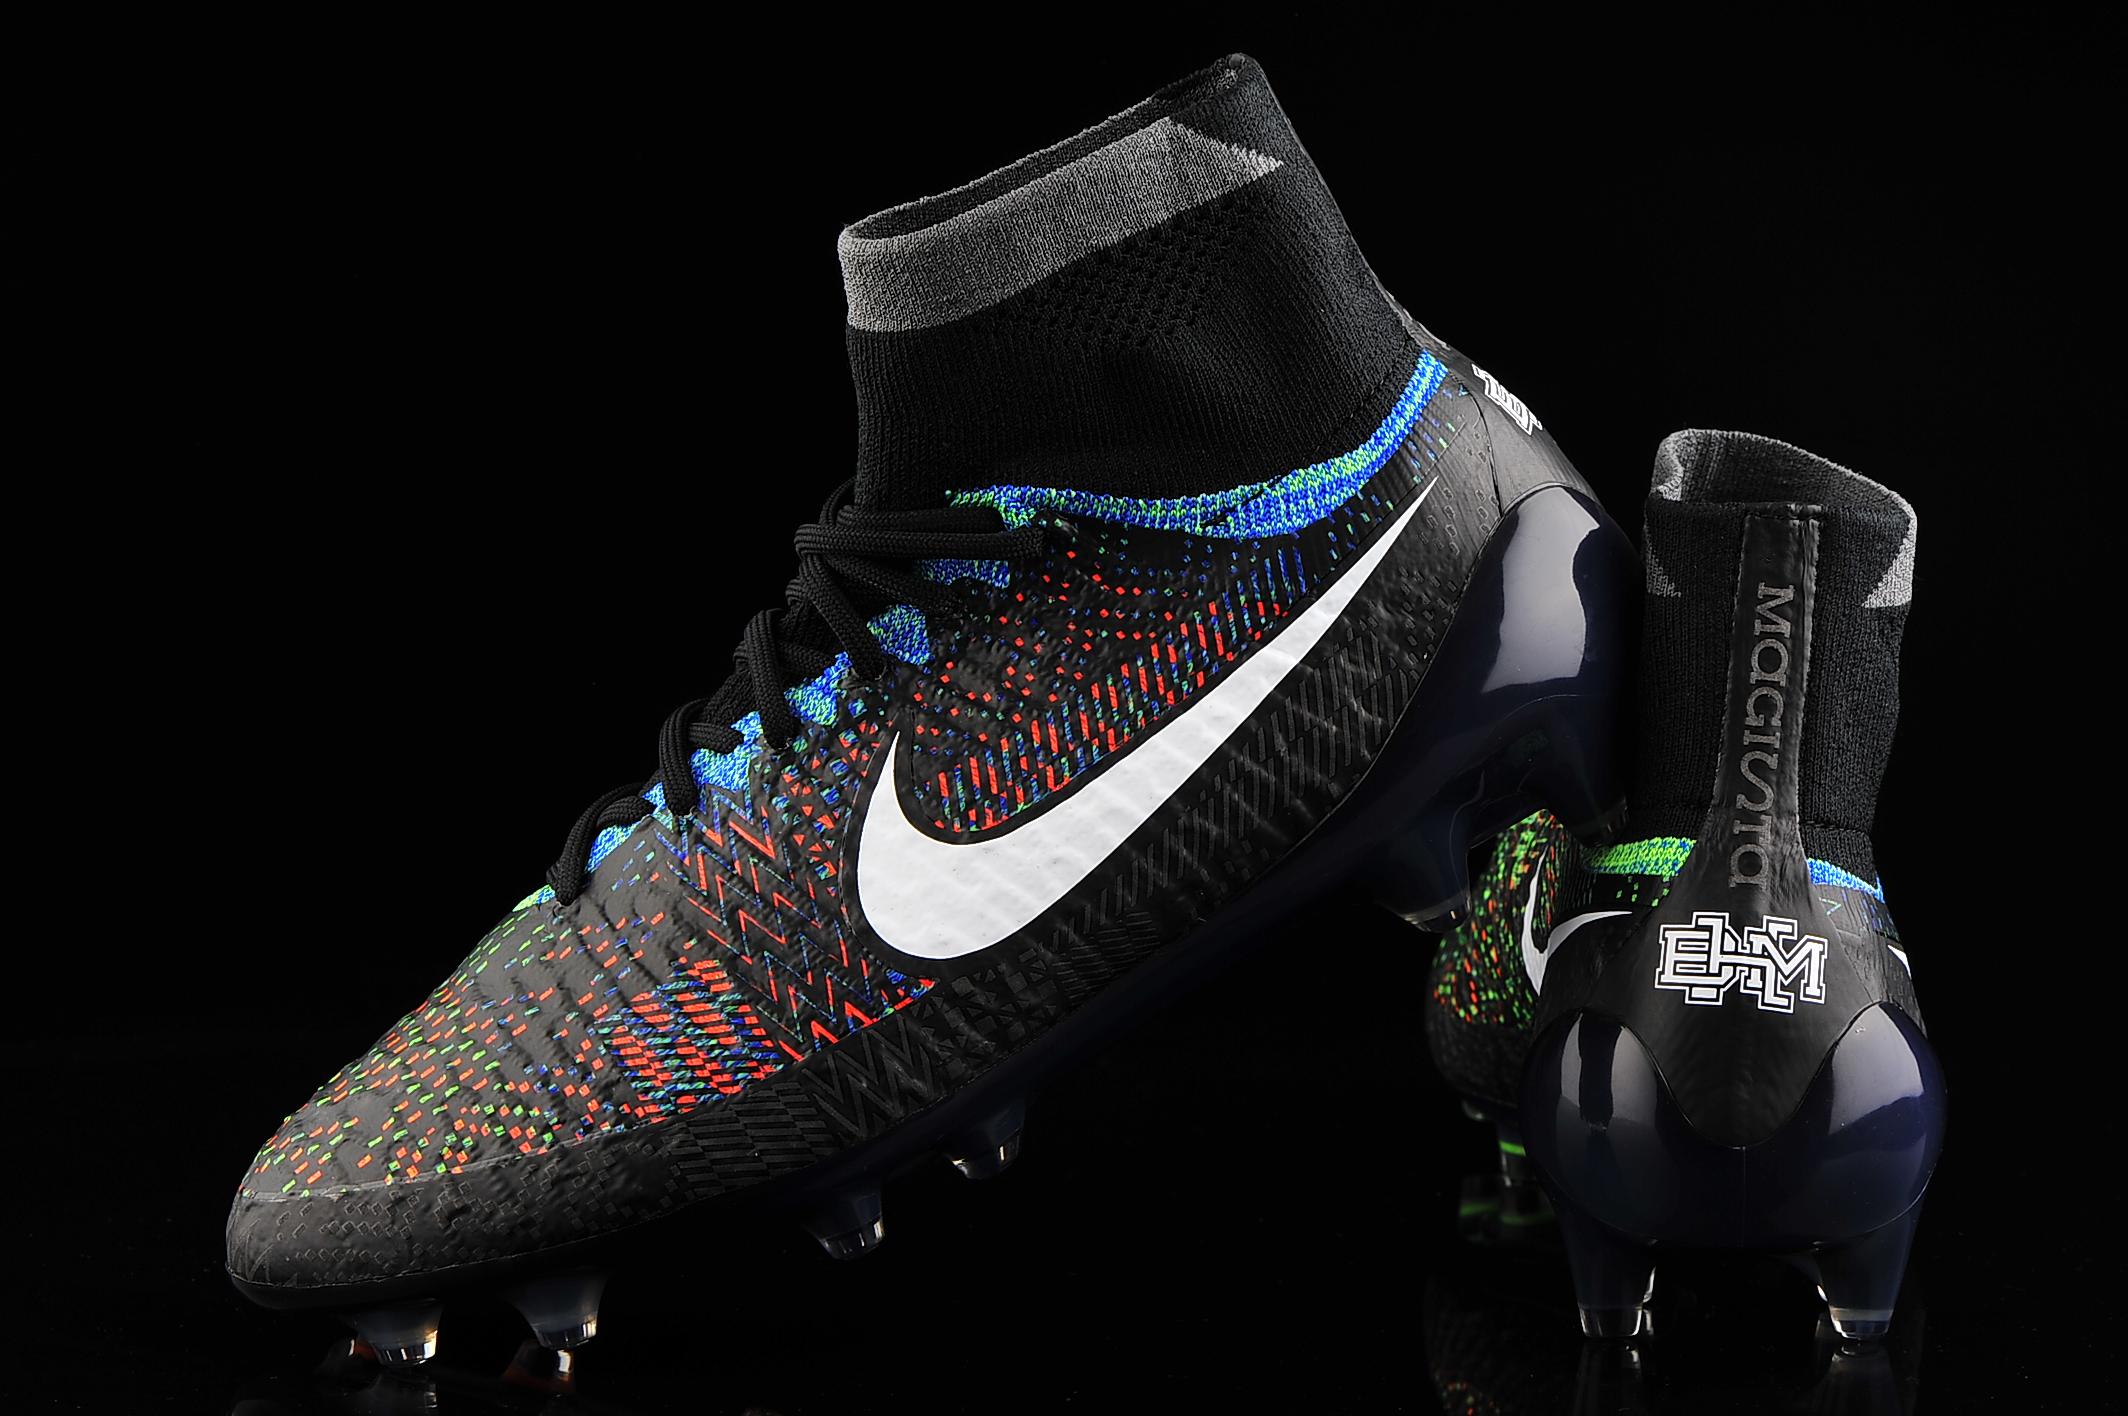 Peaje Tesoro digestión  Nike Magista Obra FG Black History Month 823081-014 Limited Edition |  R-GOL.com - Football boots & equipment